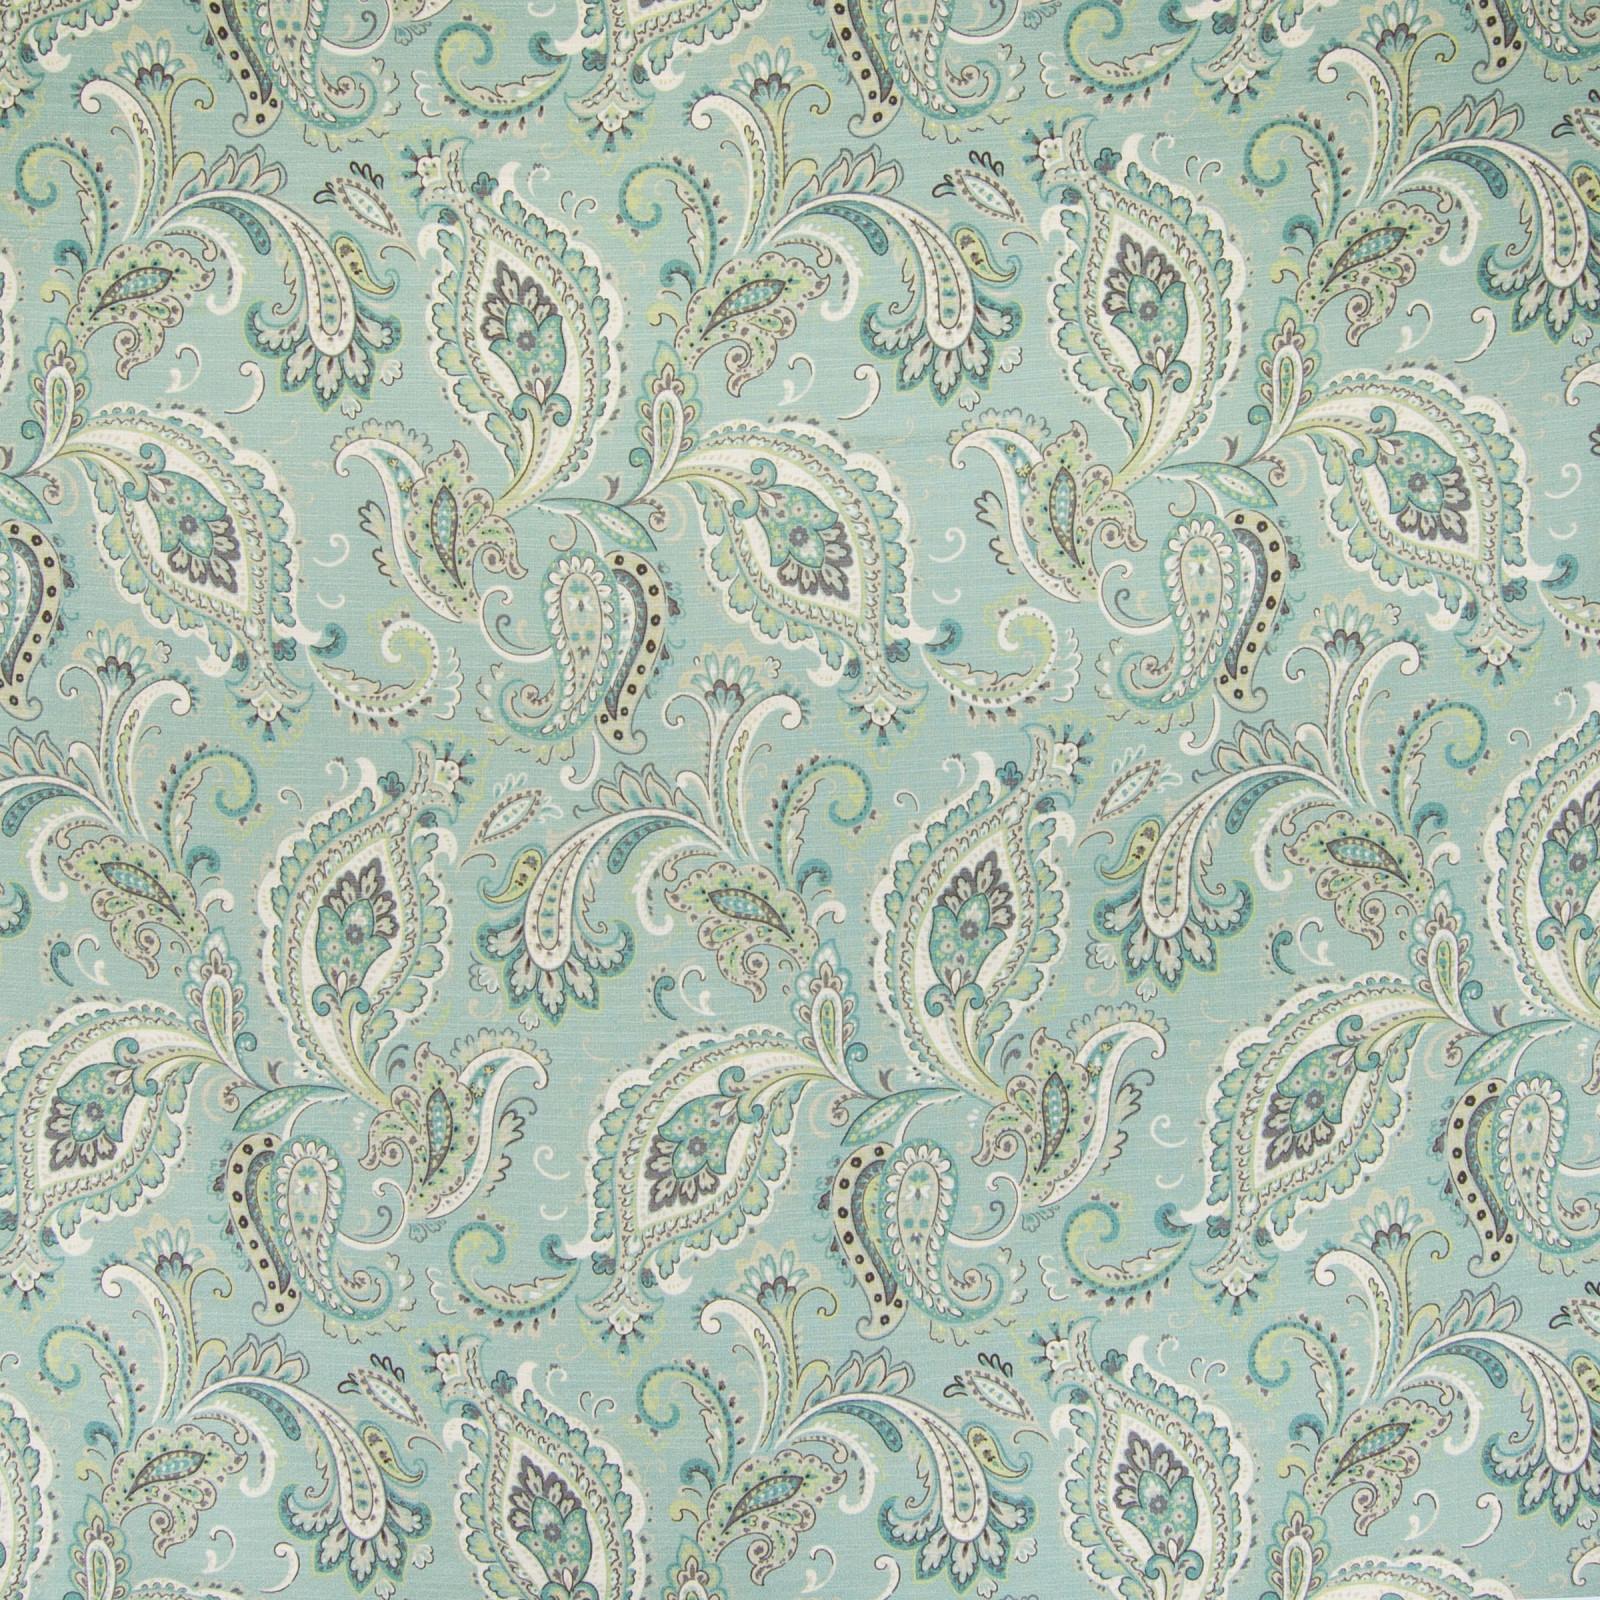 B5064 Seafoam Greenhouse Fabrics